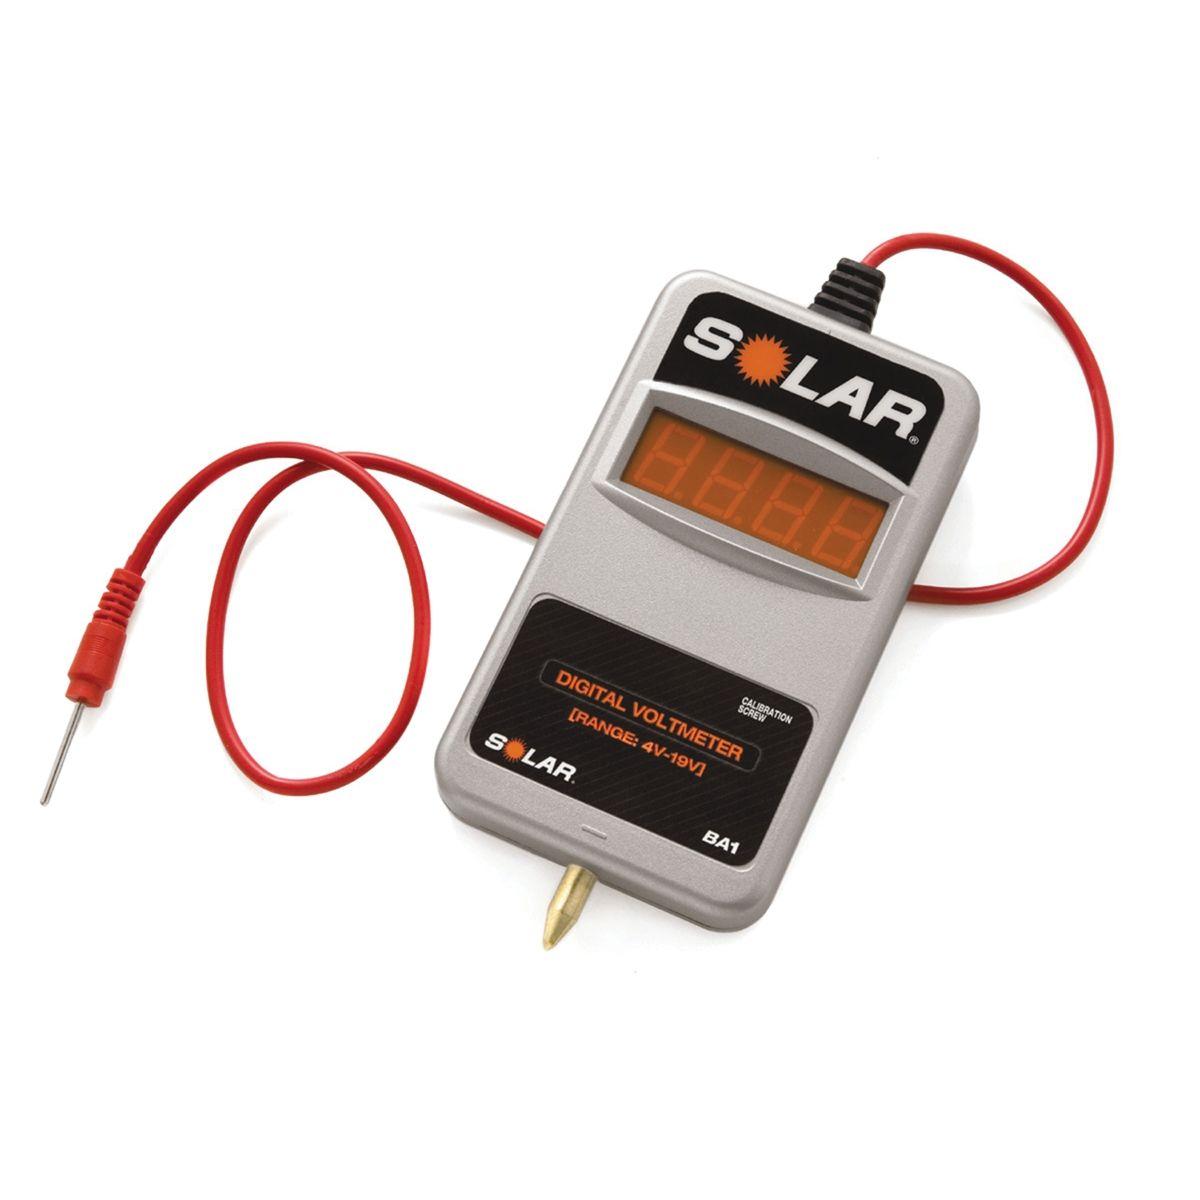 Digital Voltmeter Walmart : Solar ba volt digital voltmeter solba